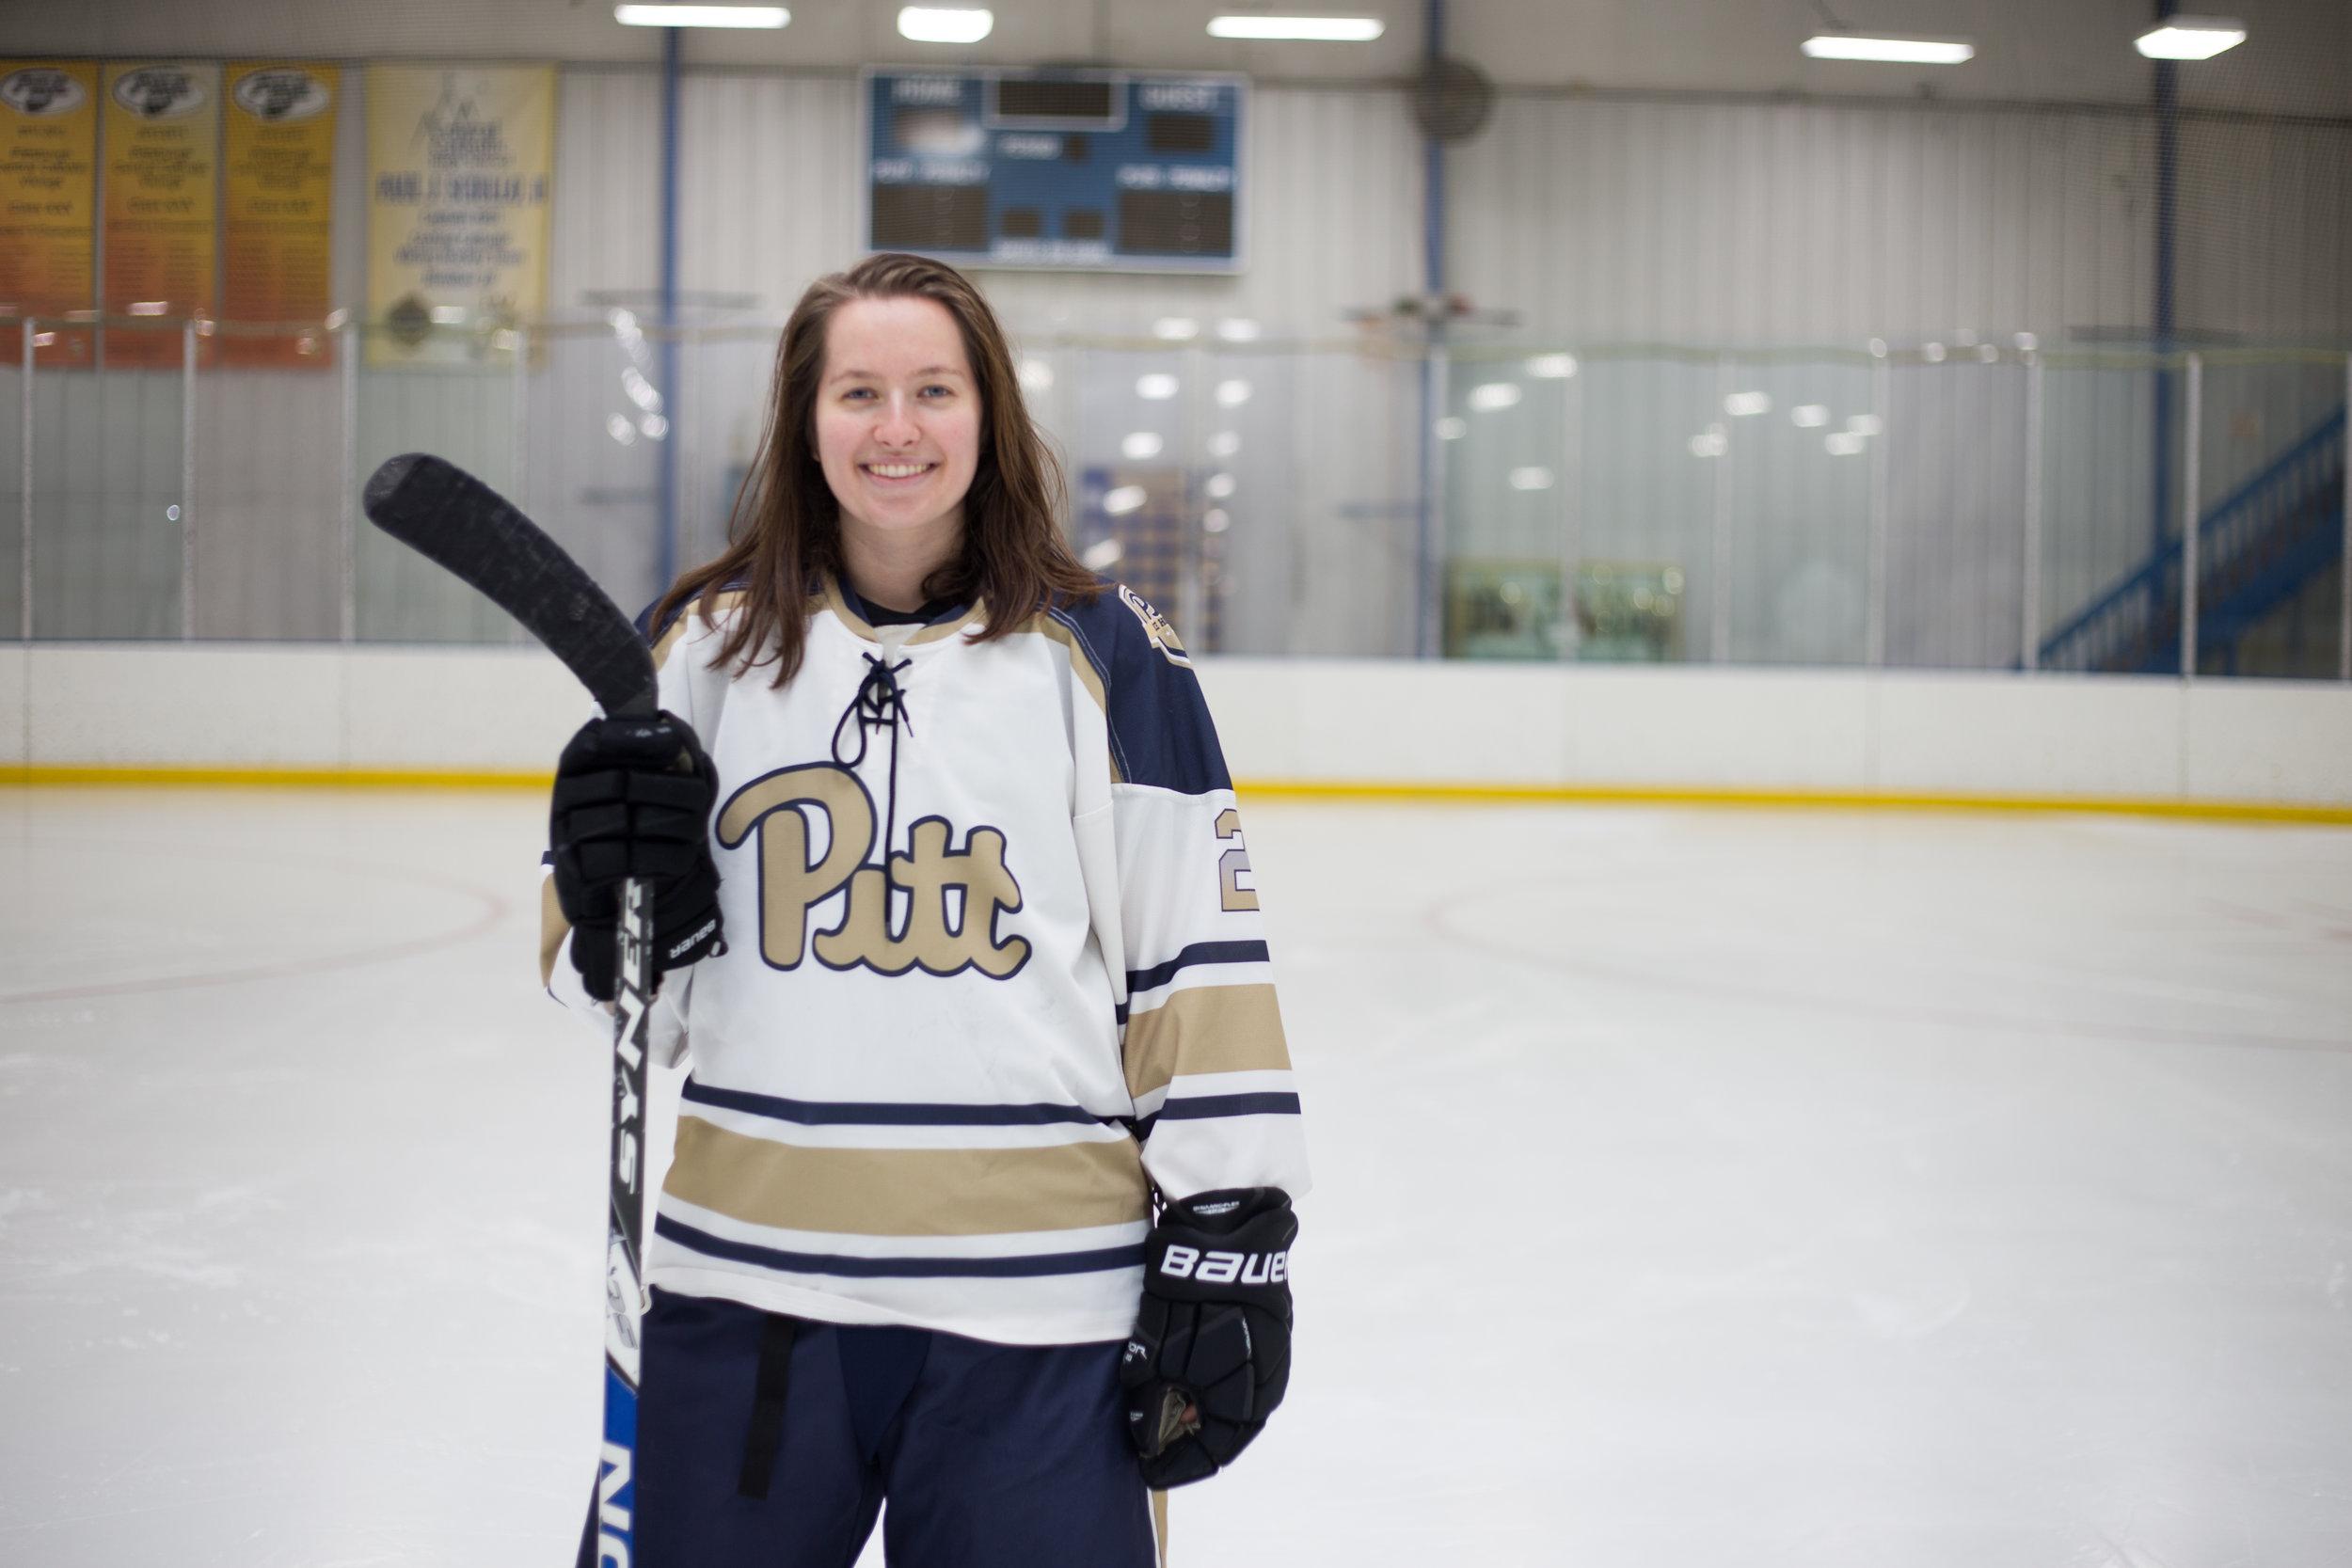 hockeyPortraits-45.JPG